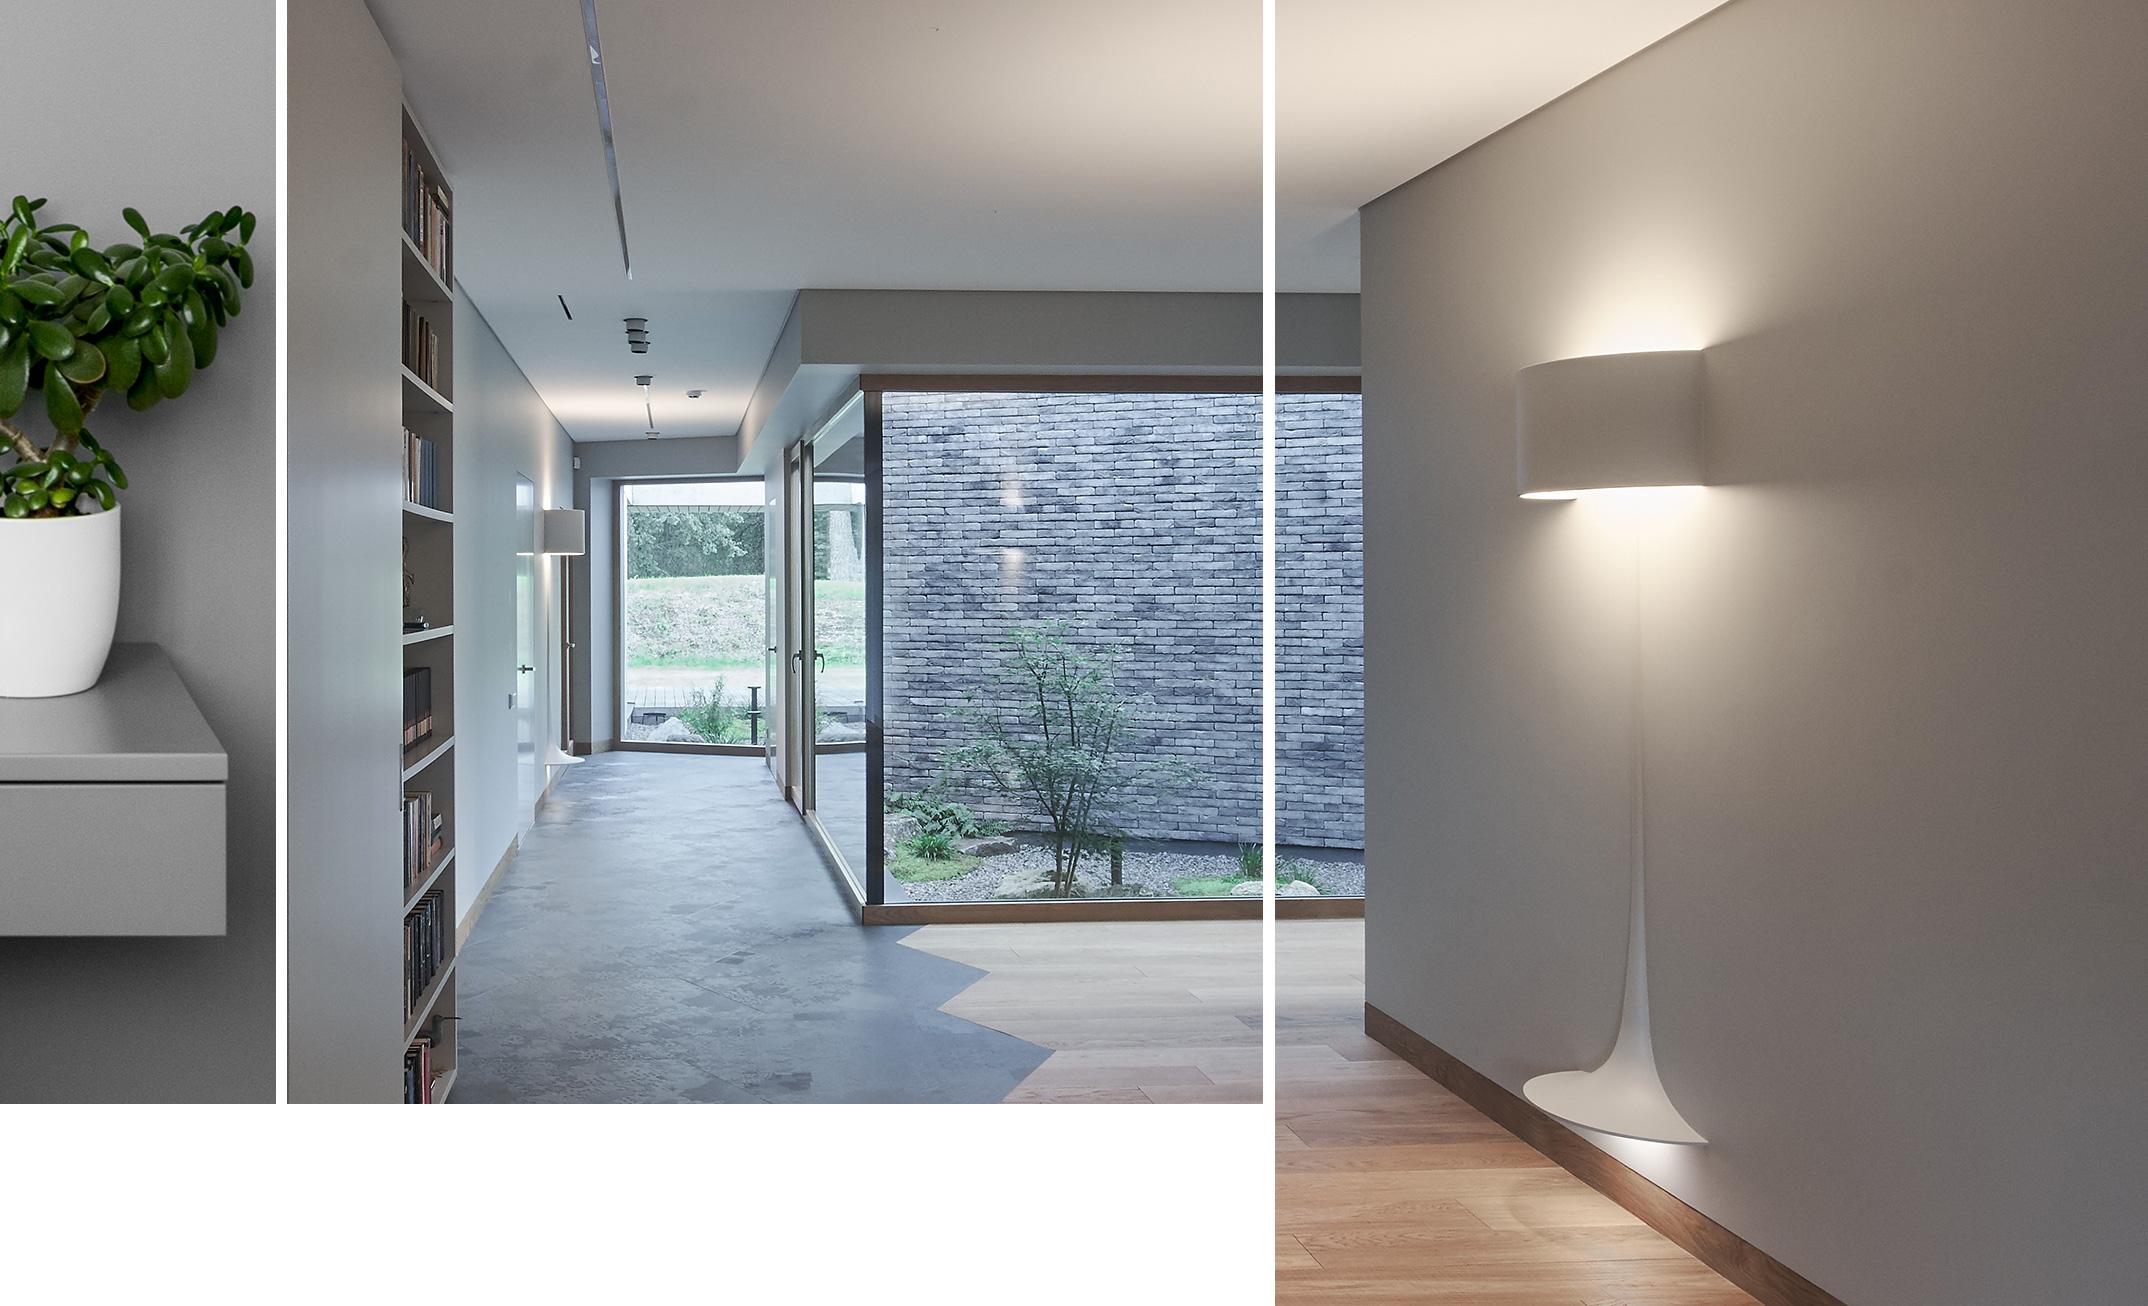 EJtekstile–-interjero-tekstiles-projektavimo-studija--Interior-textile-design-studio-2.3